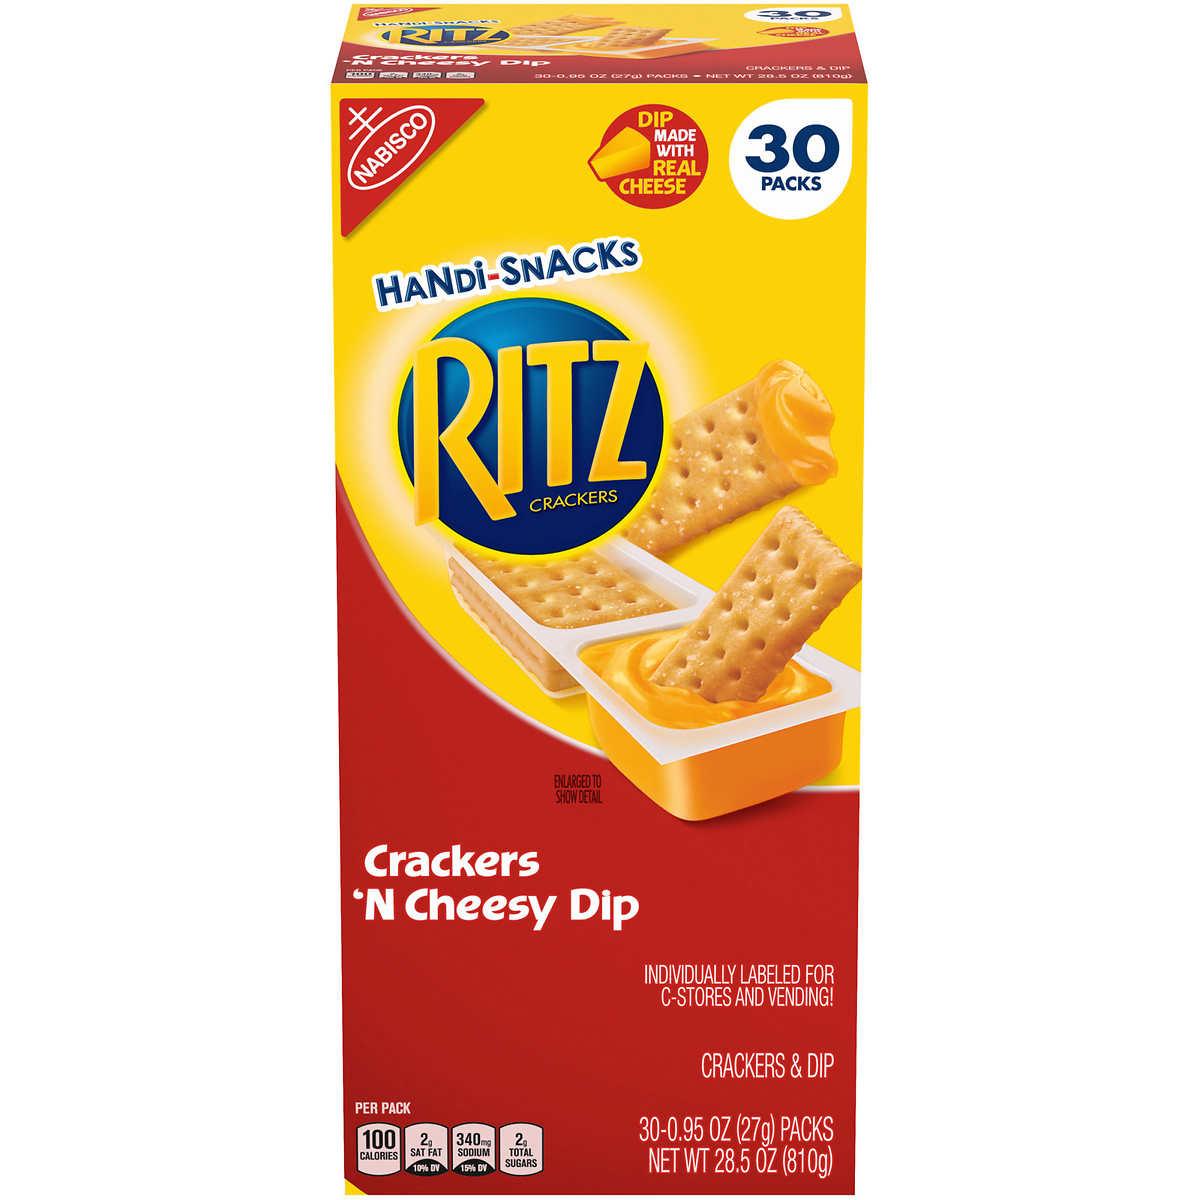 Ritz Crackers Handi-Snacks, Crackers 'N Cheese Dip, 0 95 oz, 30-count